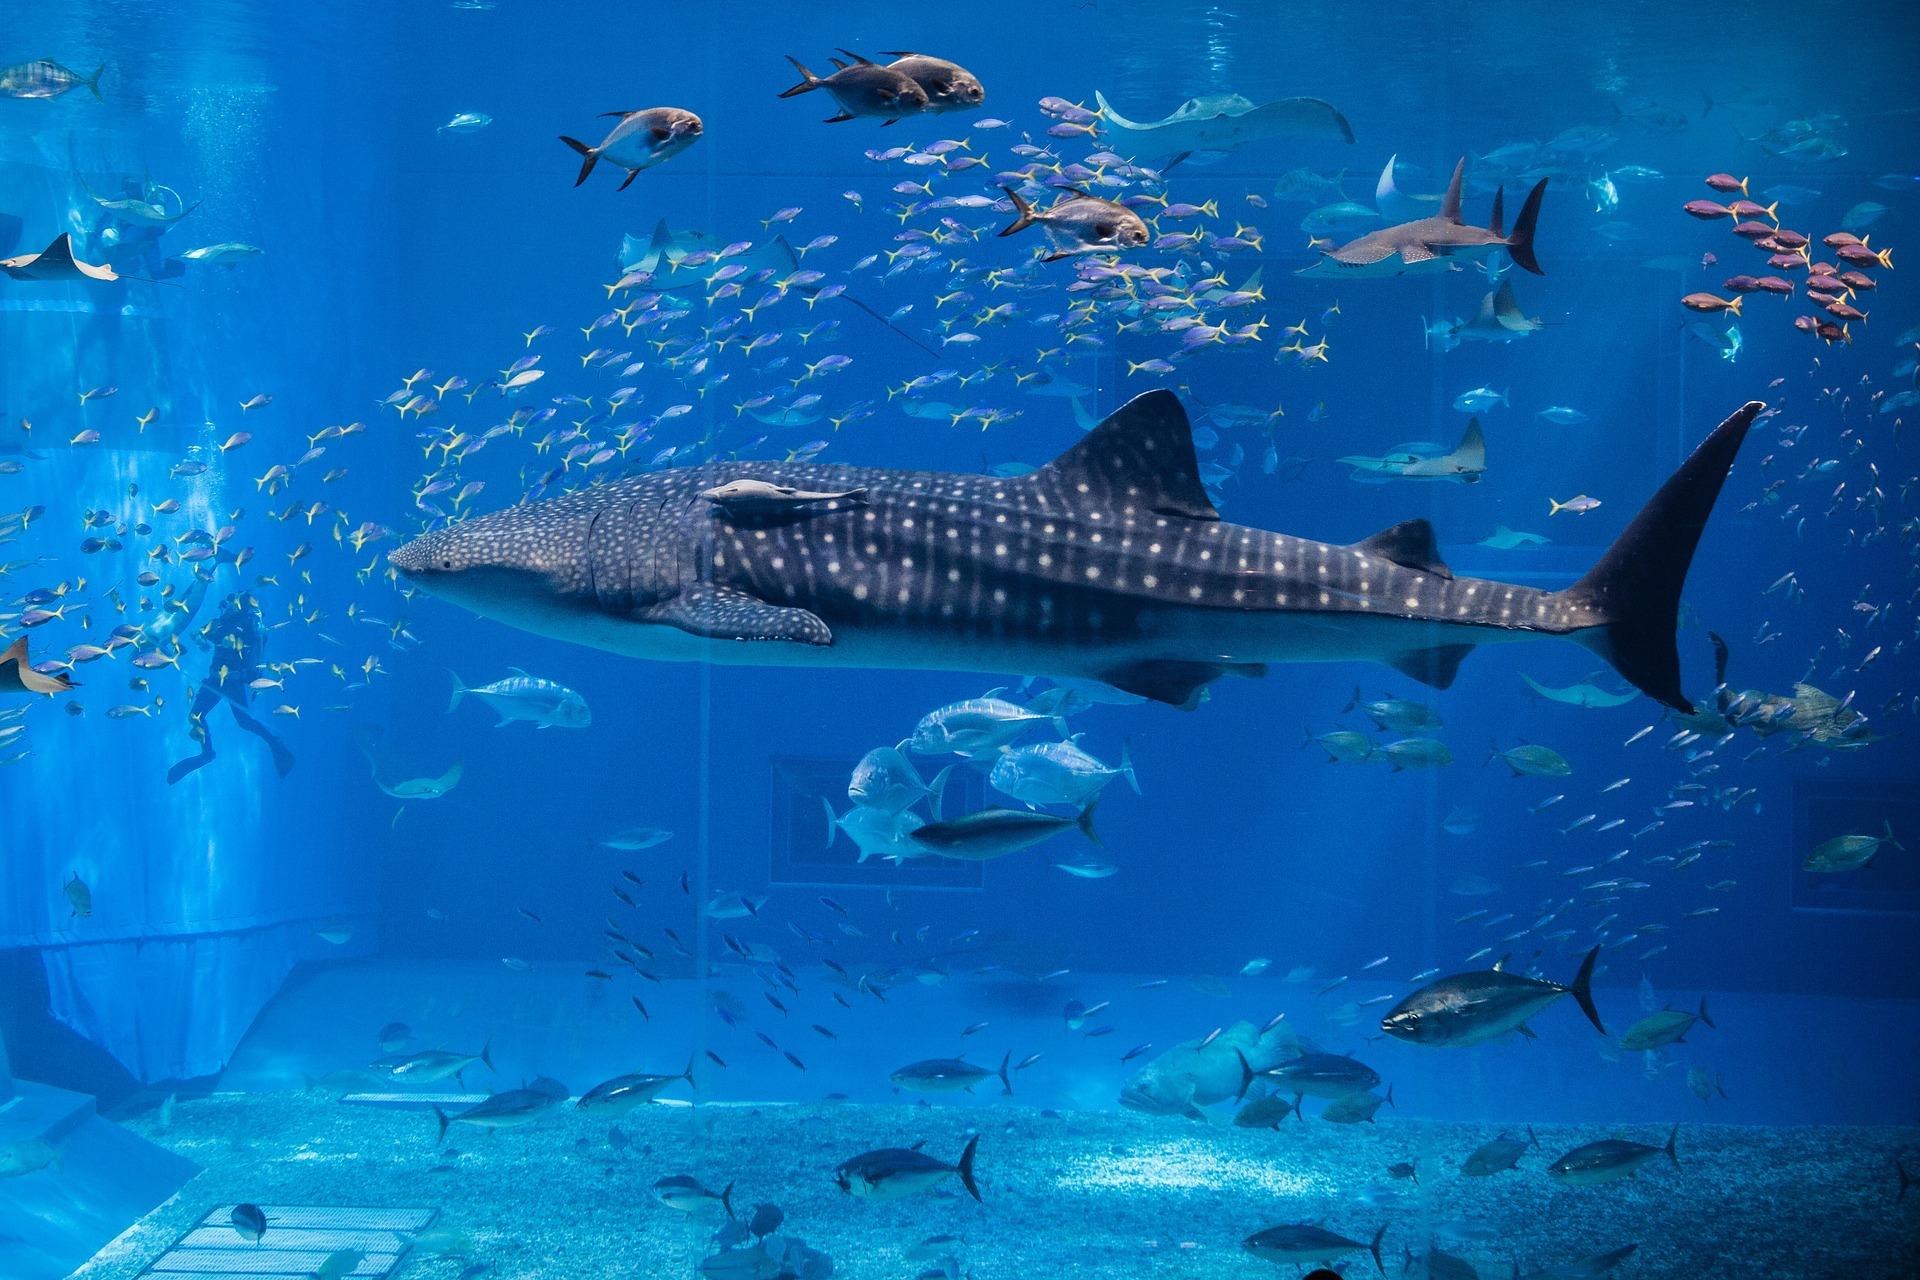 L'aquarium de Séville